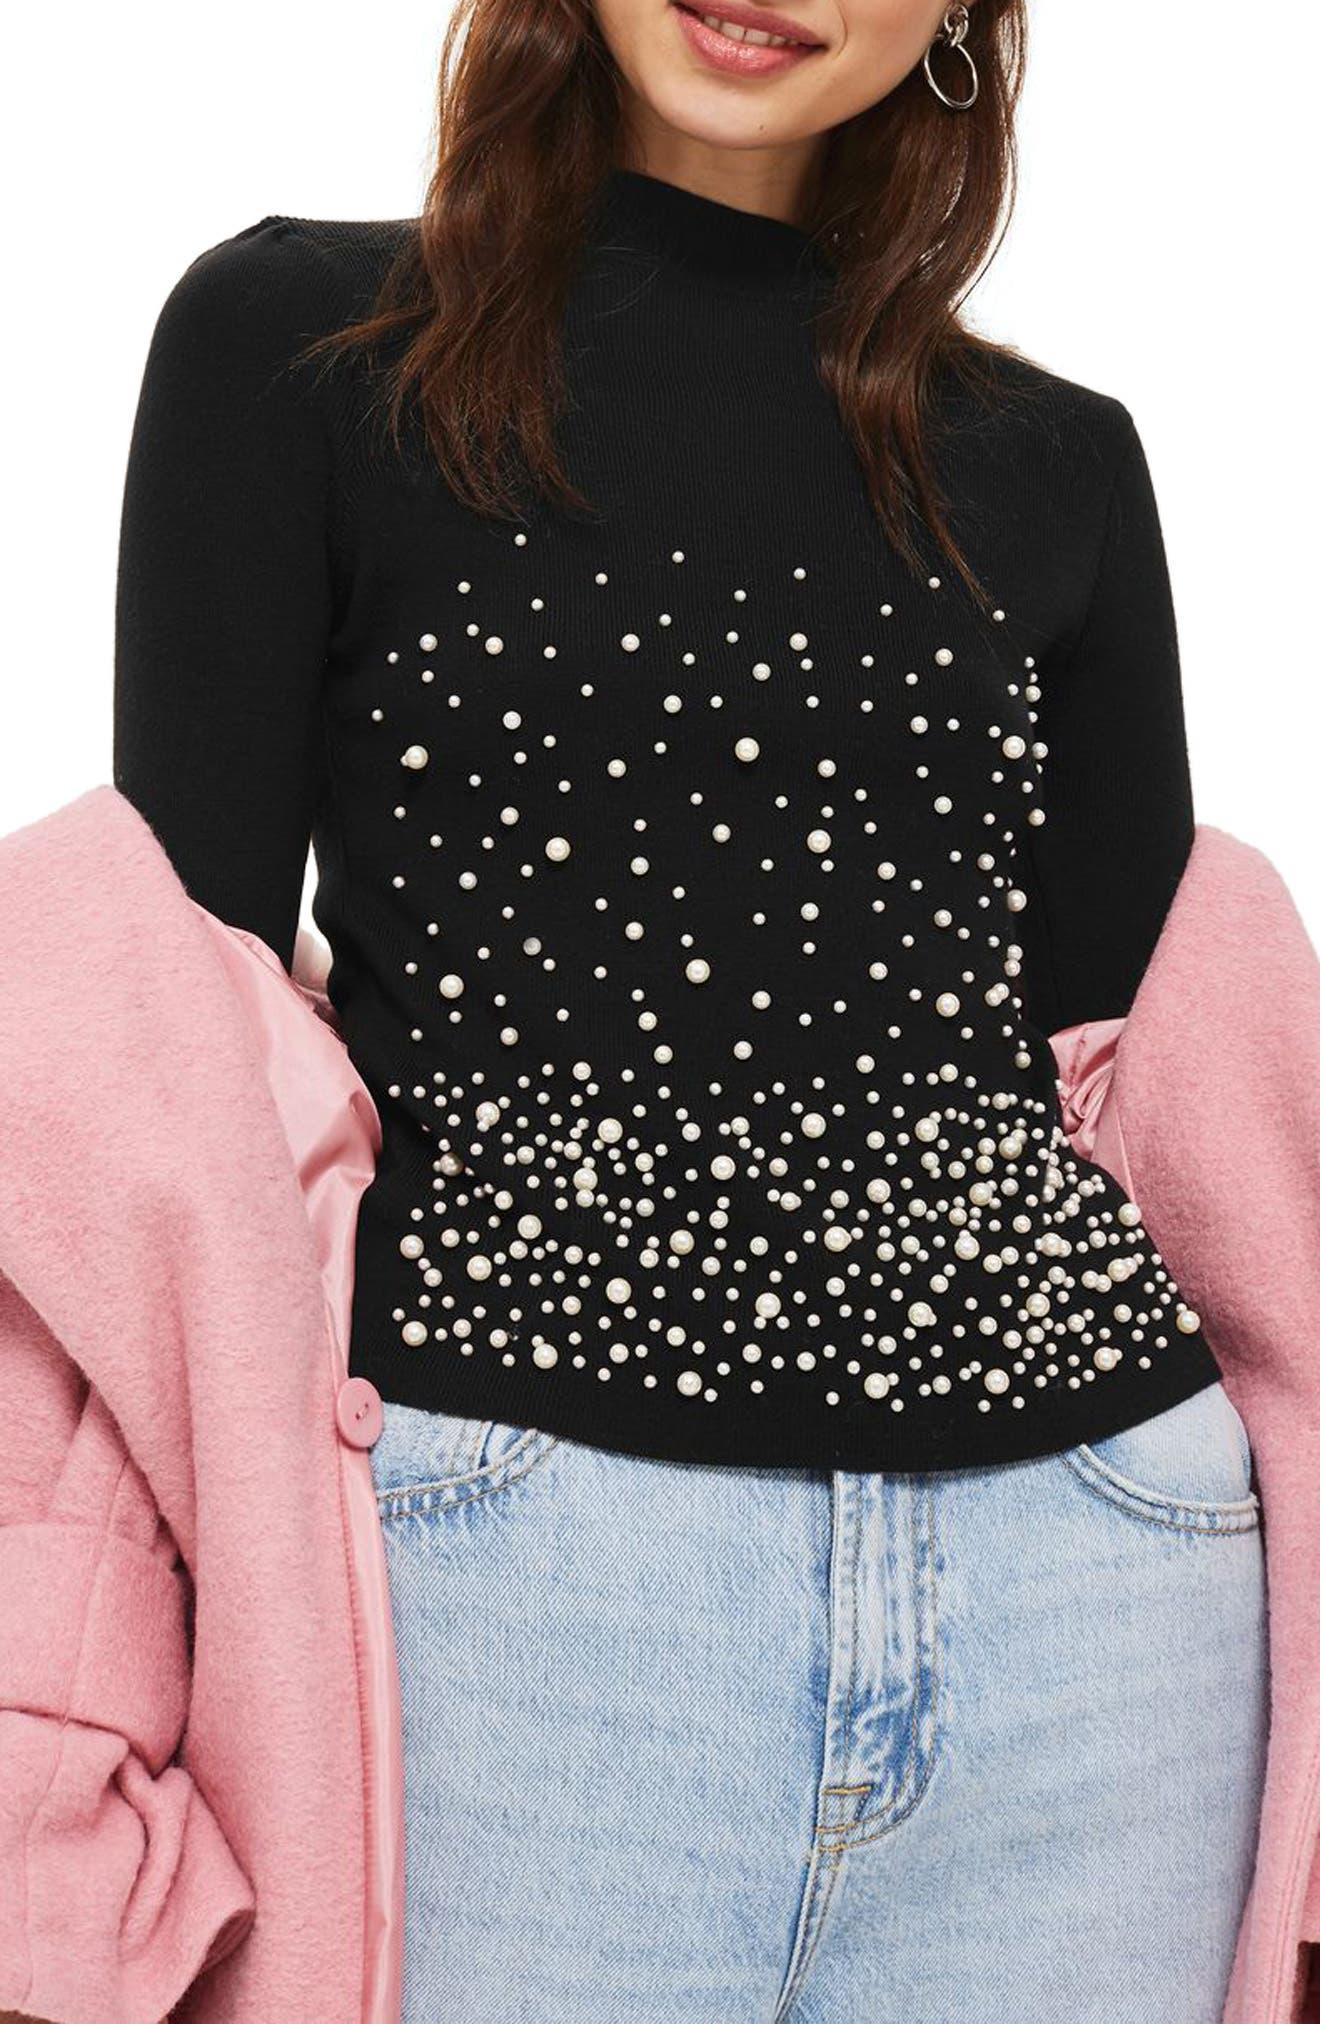 Graduated Imitation Pearl Sweater,                         Main,                         color, Black Multi